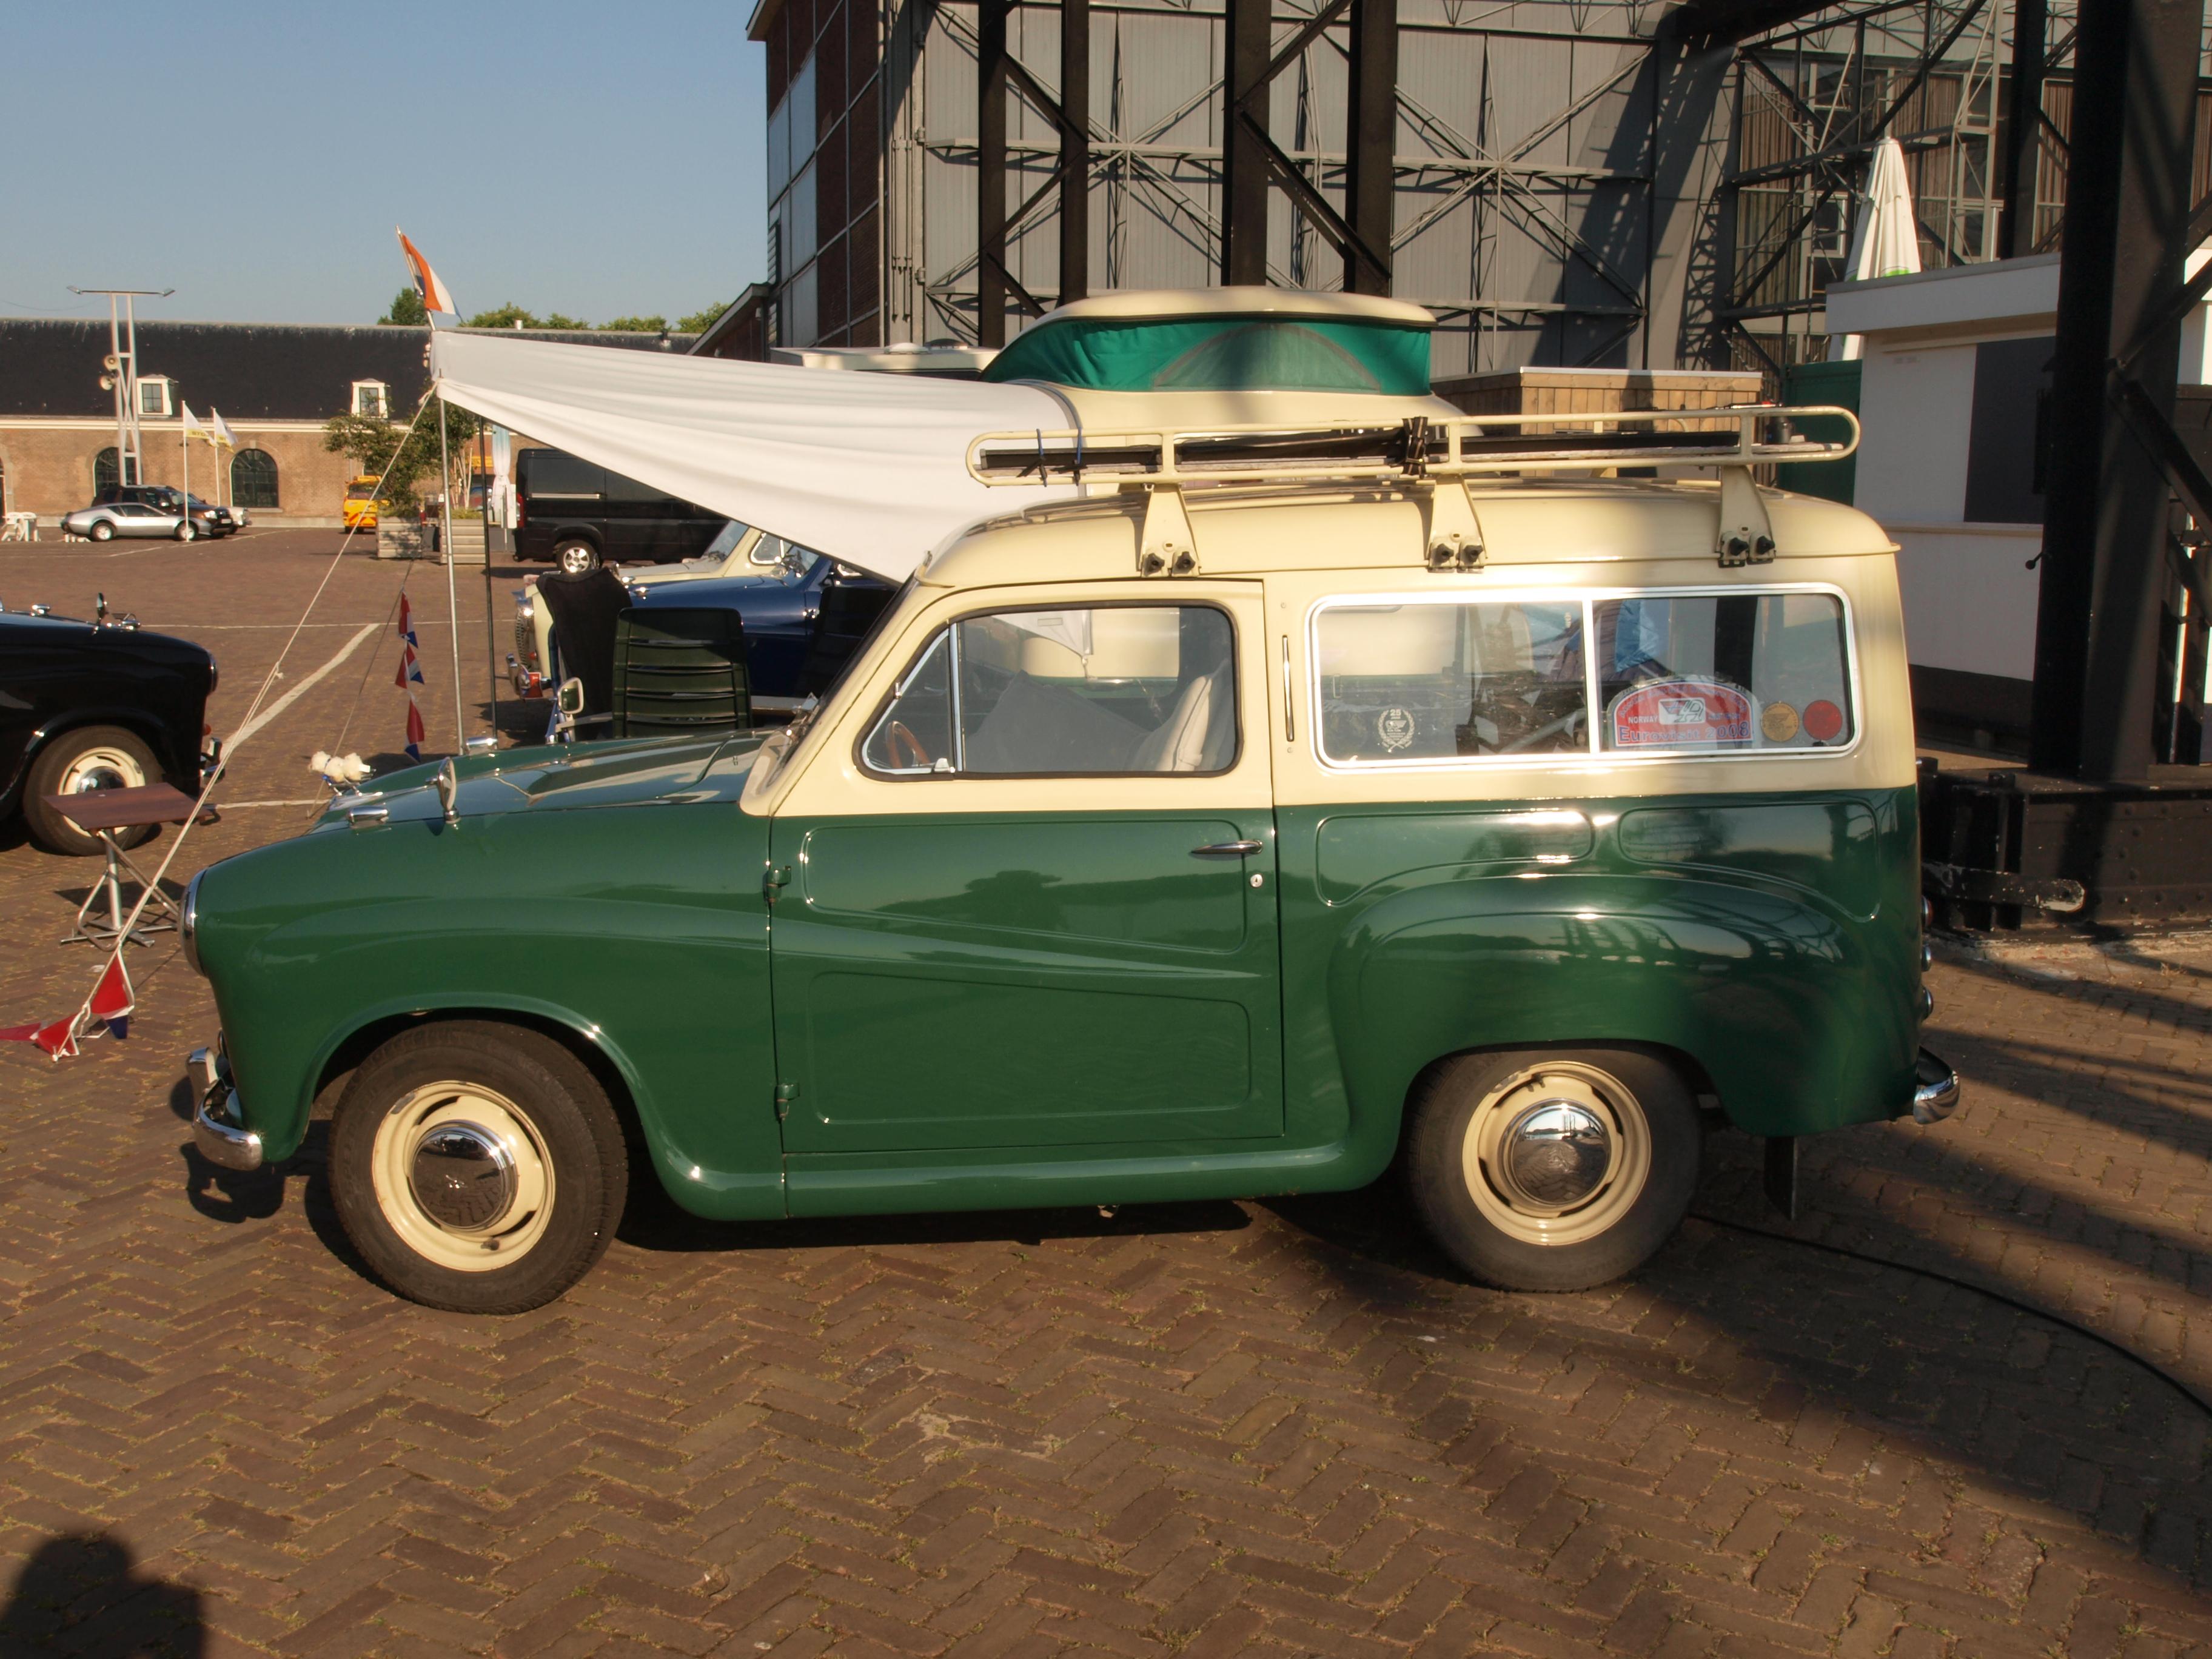 File:Austin A30 (1955), Dutch licence registration PA-60-49 pic2 ...